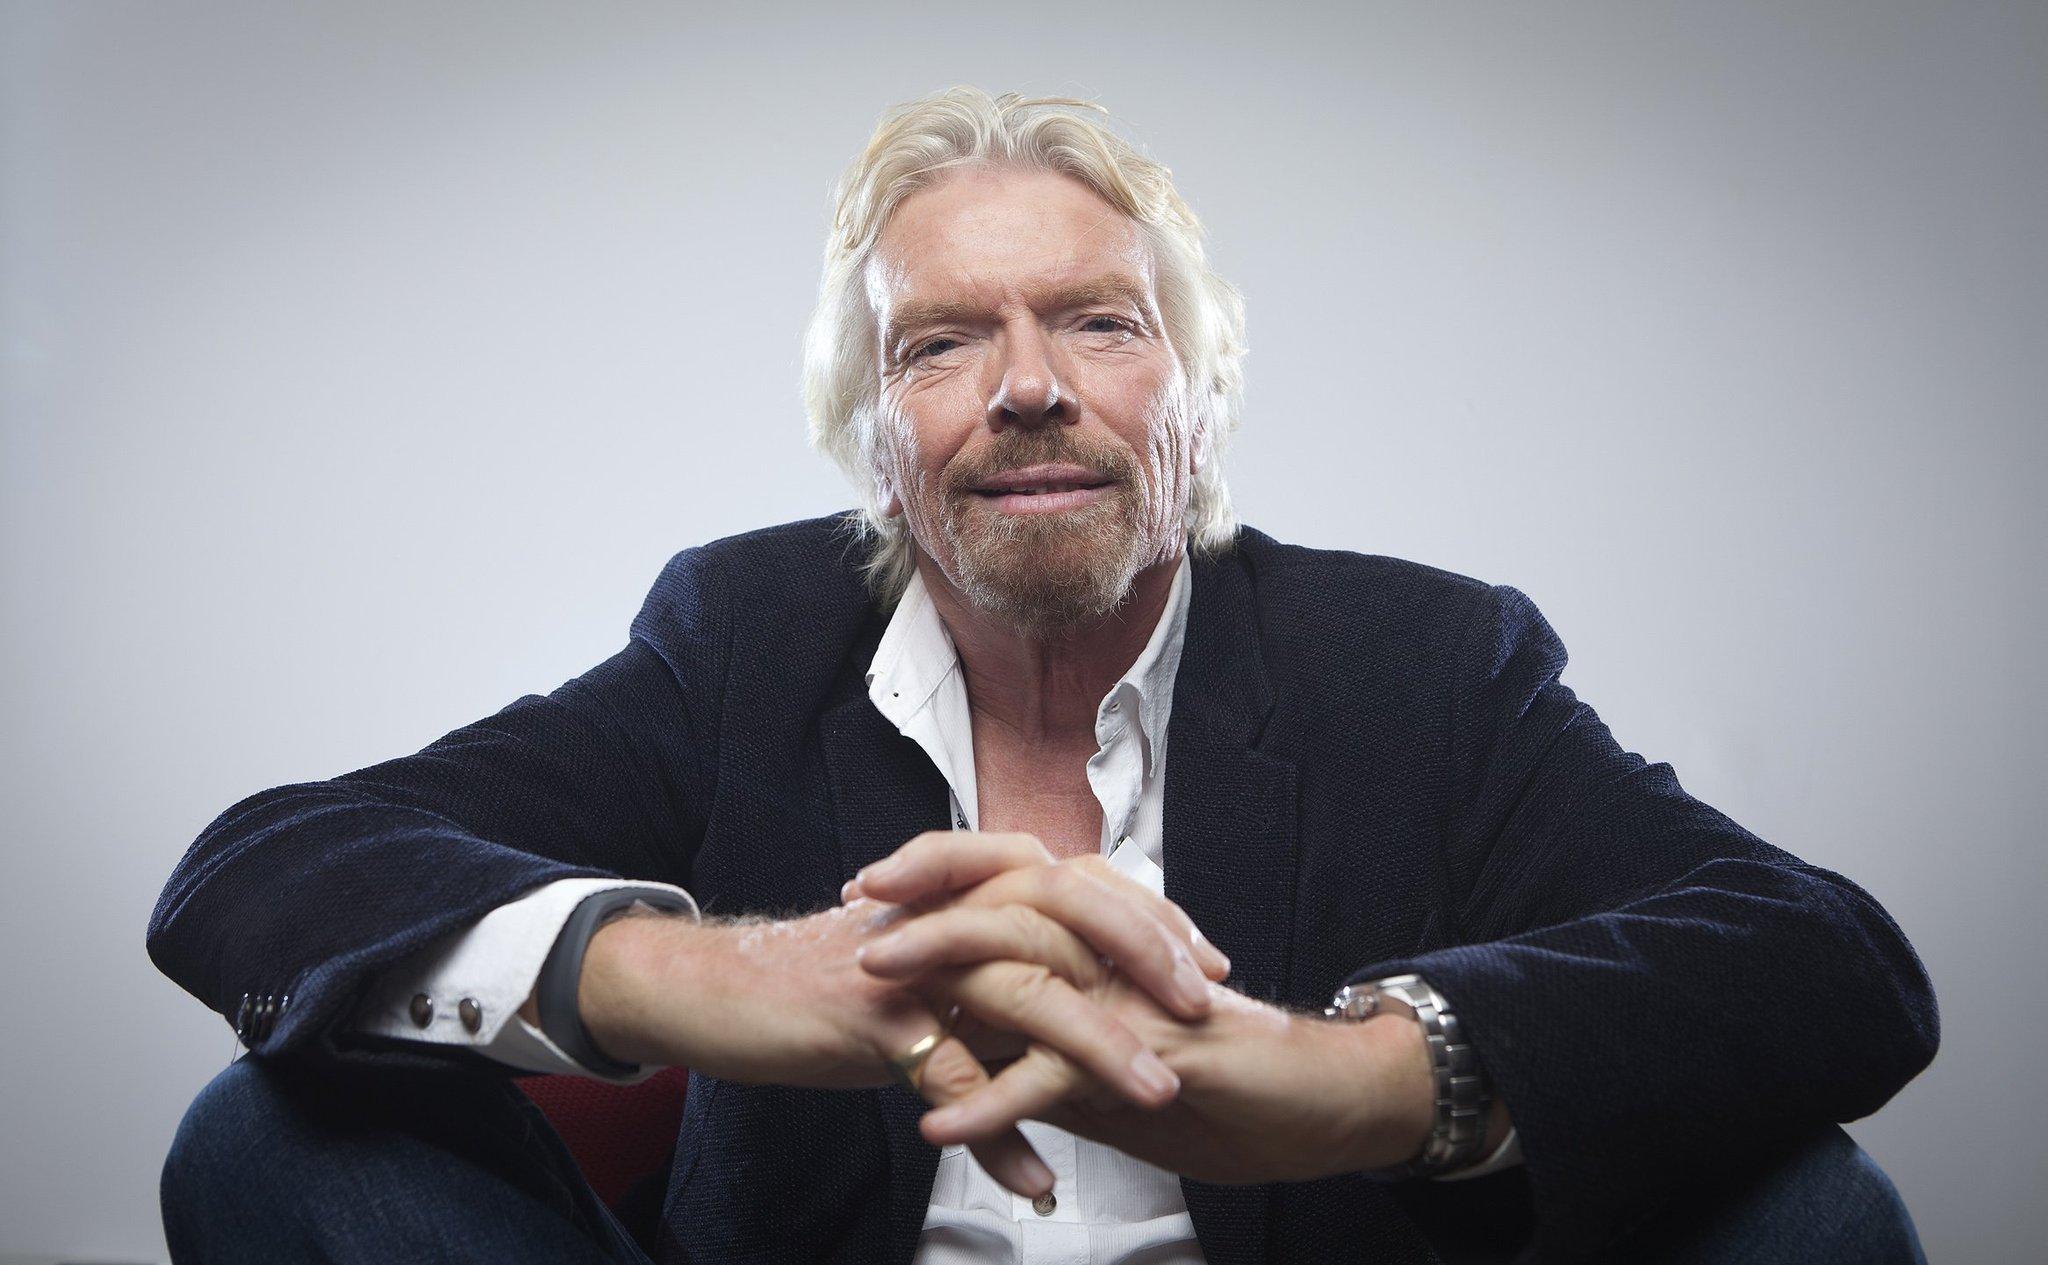 35 Richard Branson Quotes on Entrepreneurship & Business ...